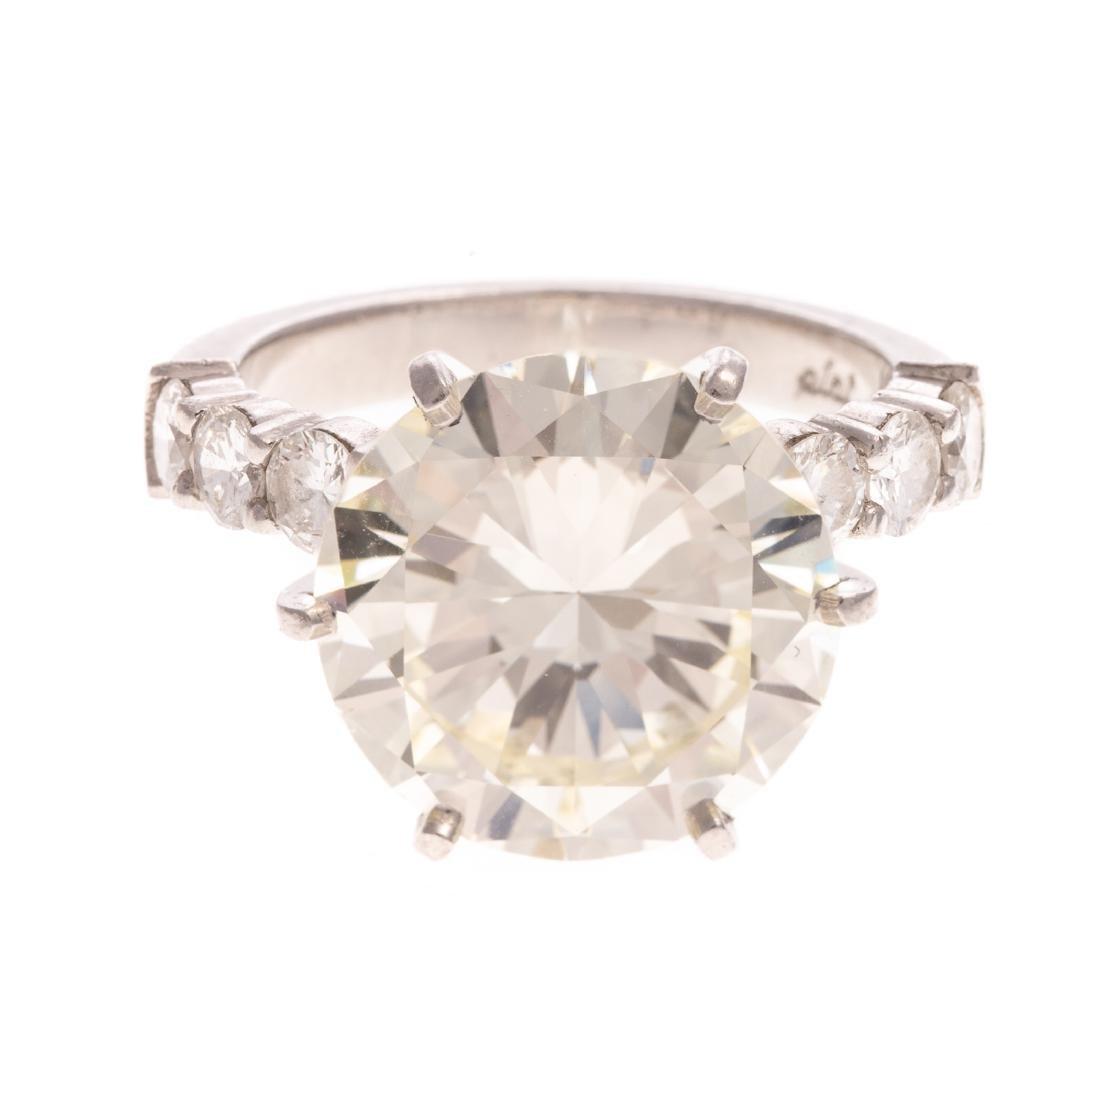 A Statement Platinum 9.28ct Diamond Ring